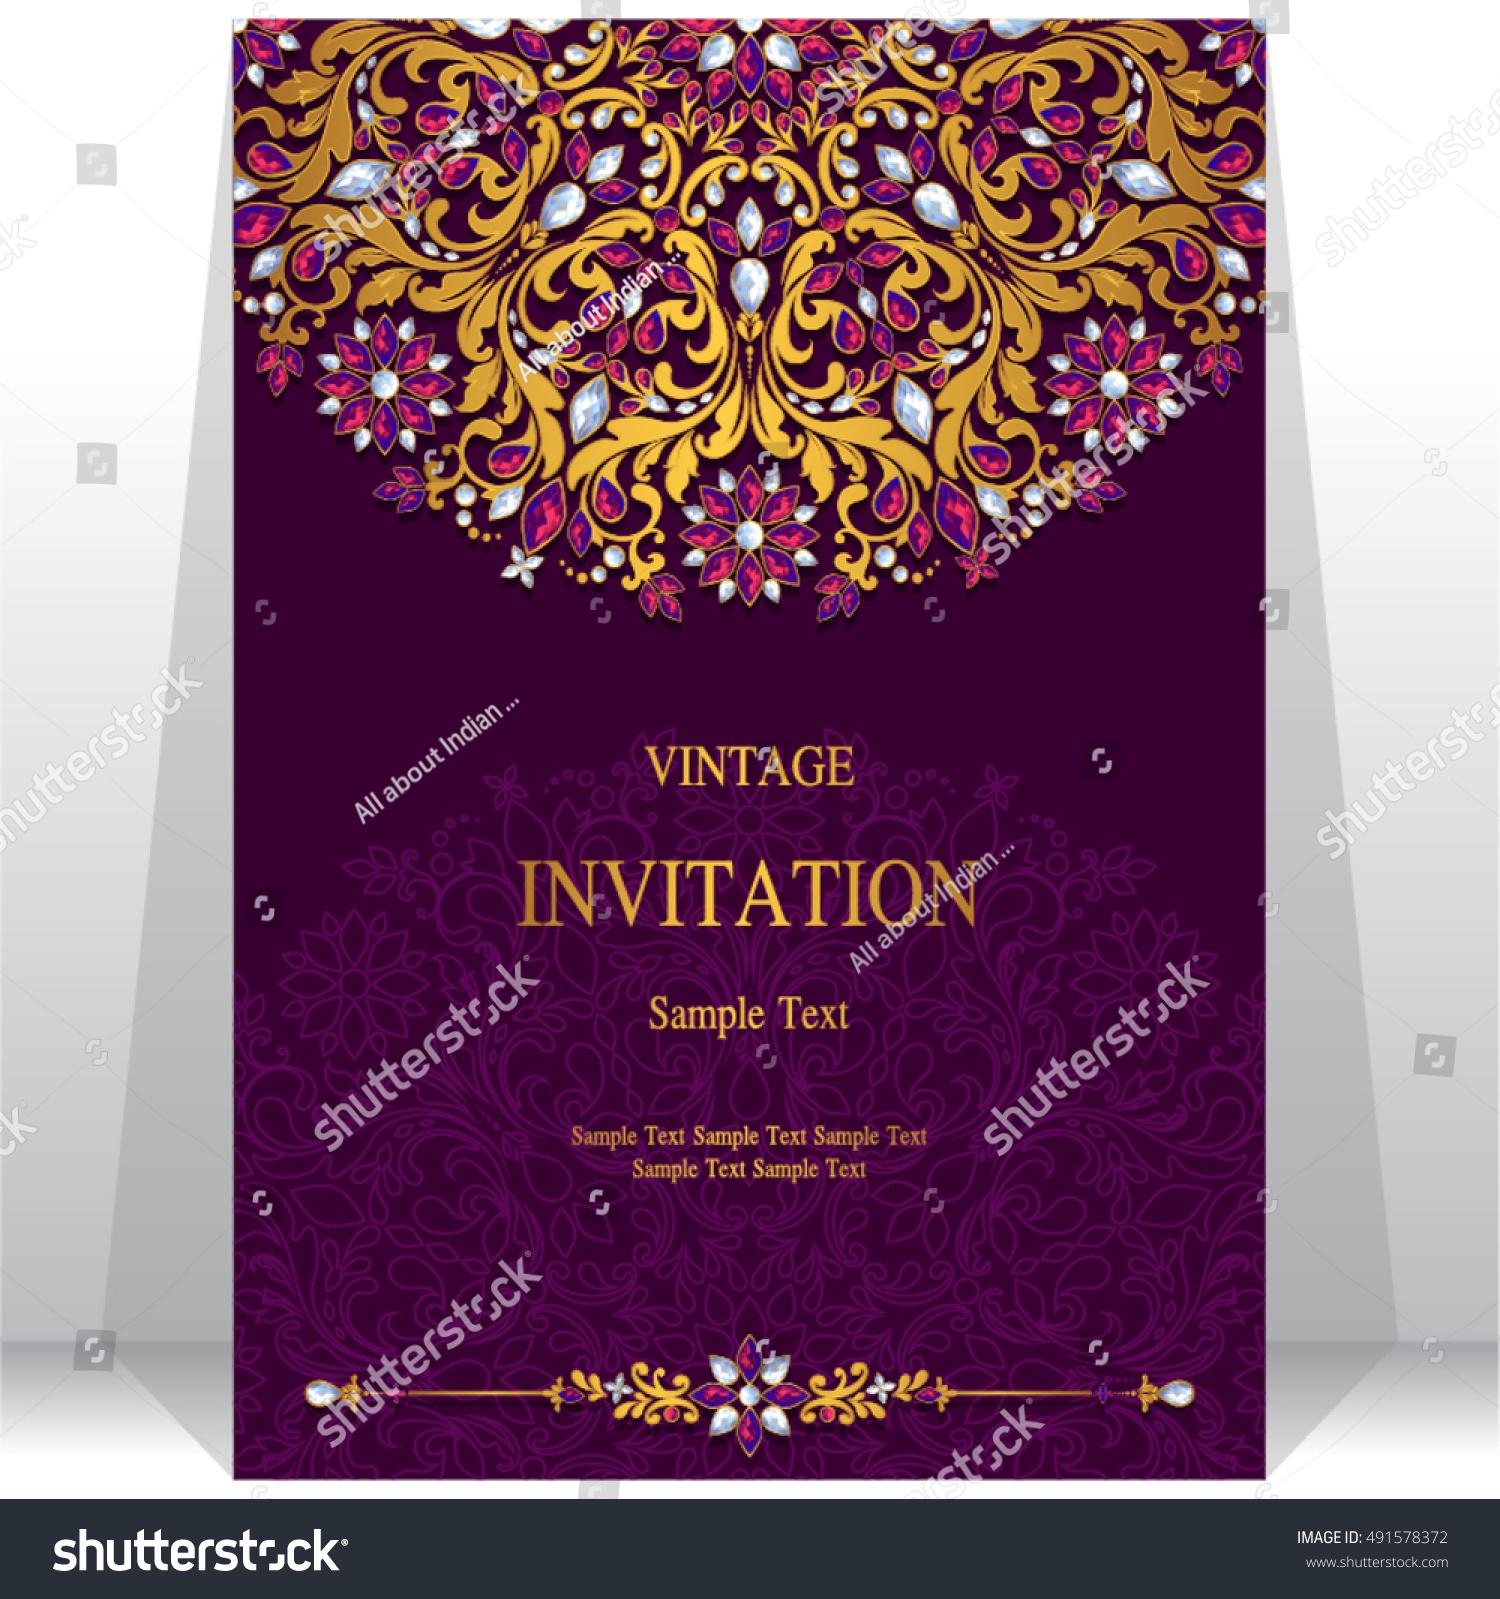 Wedding invitation card abstract background stock vector 491578372 wedding invitation or card with abstract background monicamarmolfo Choice Image